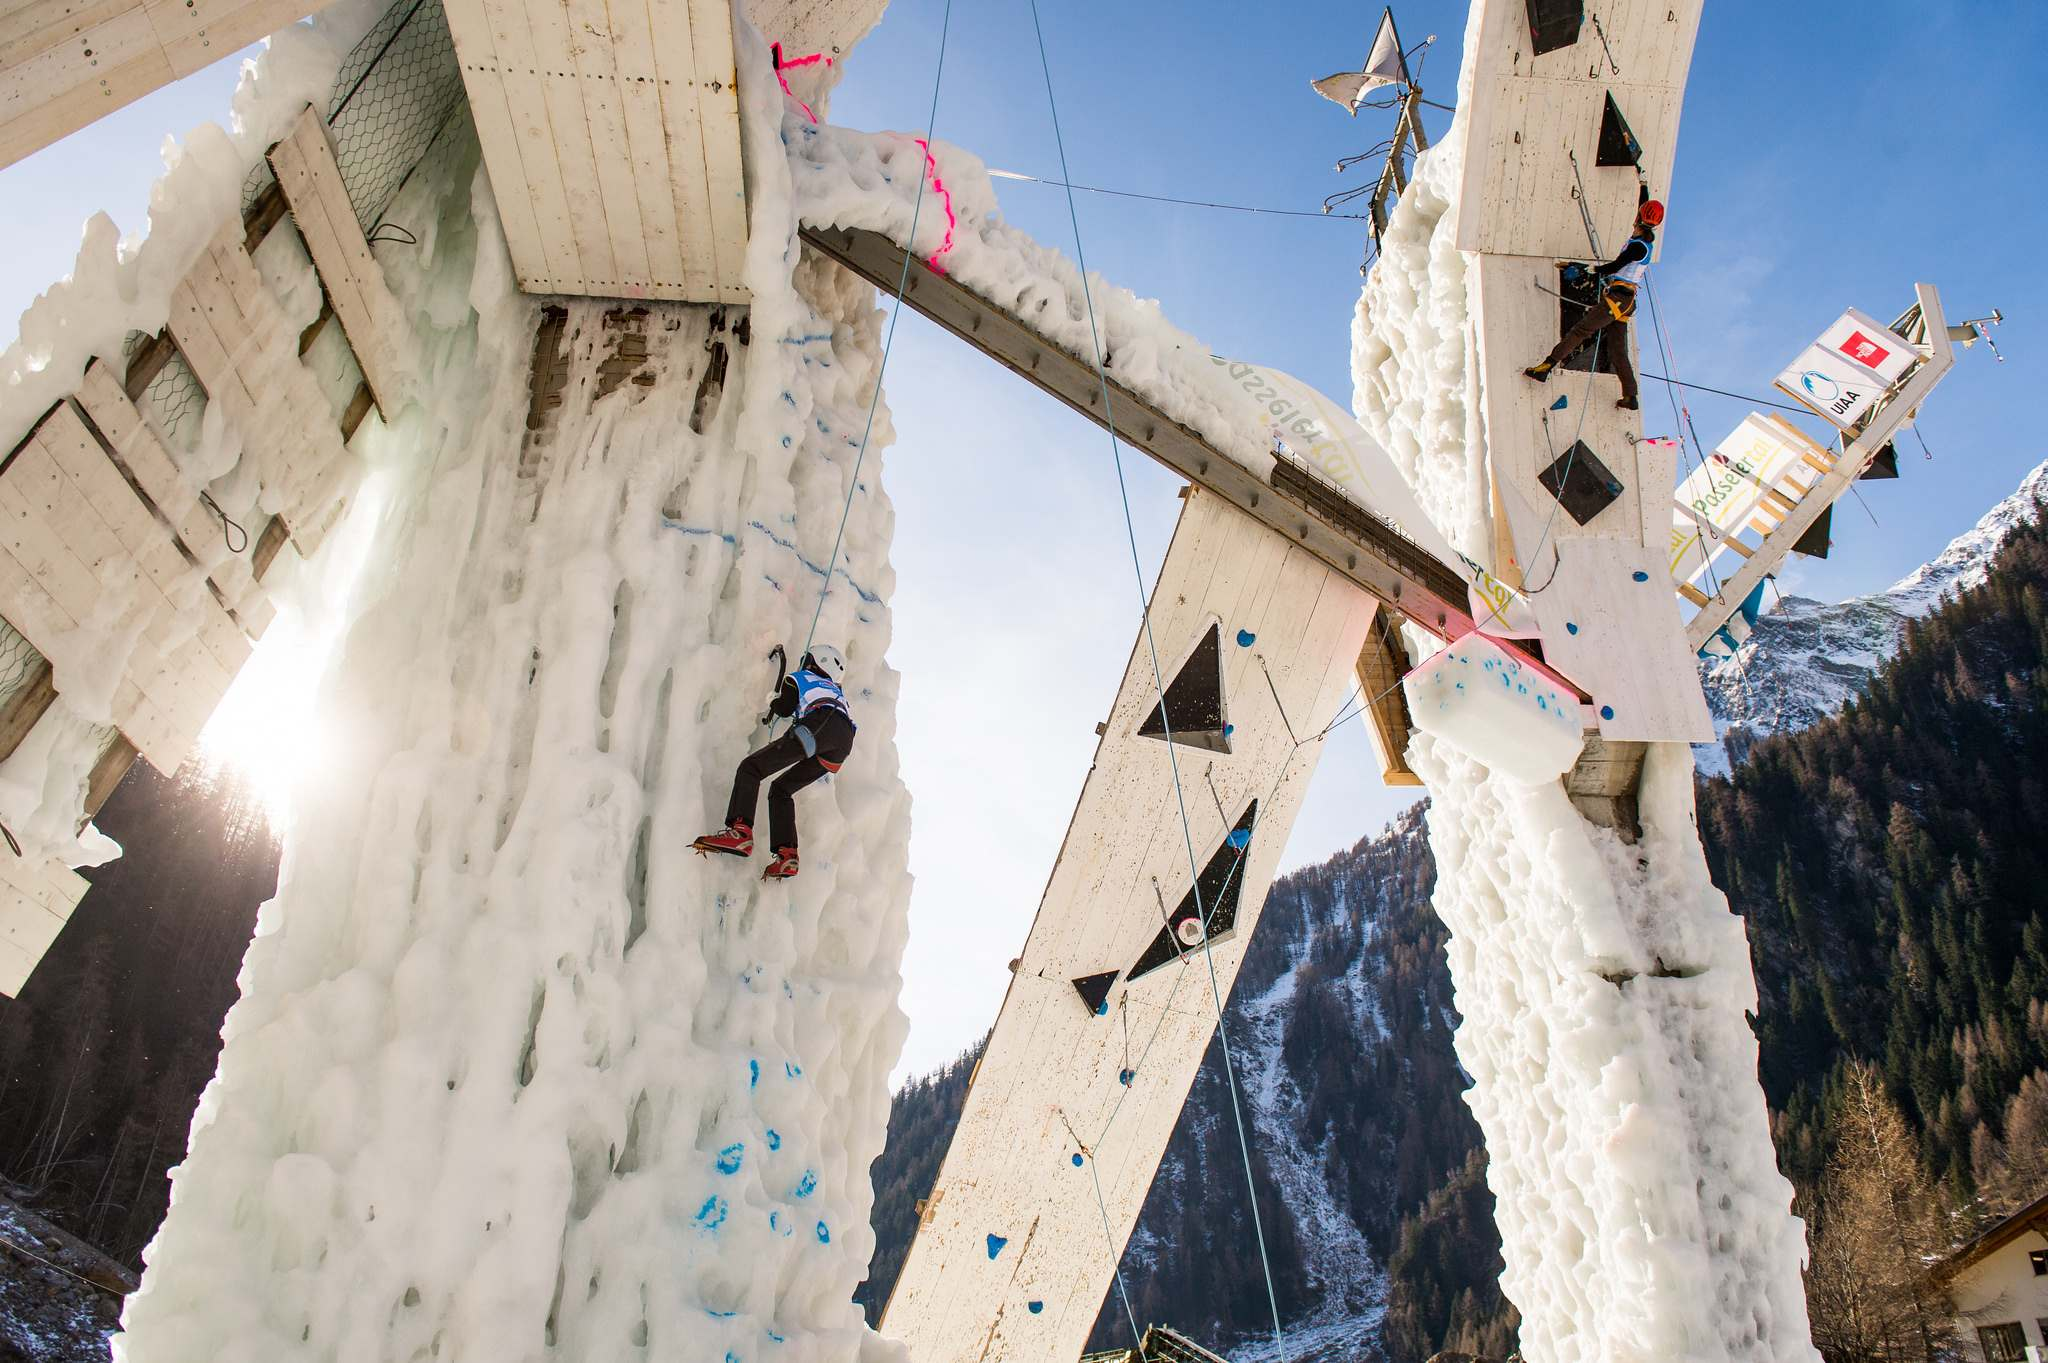 ice climbing1 Ice Climbing World Youth Championships 2016 in Rabenstein